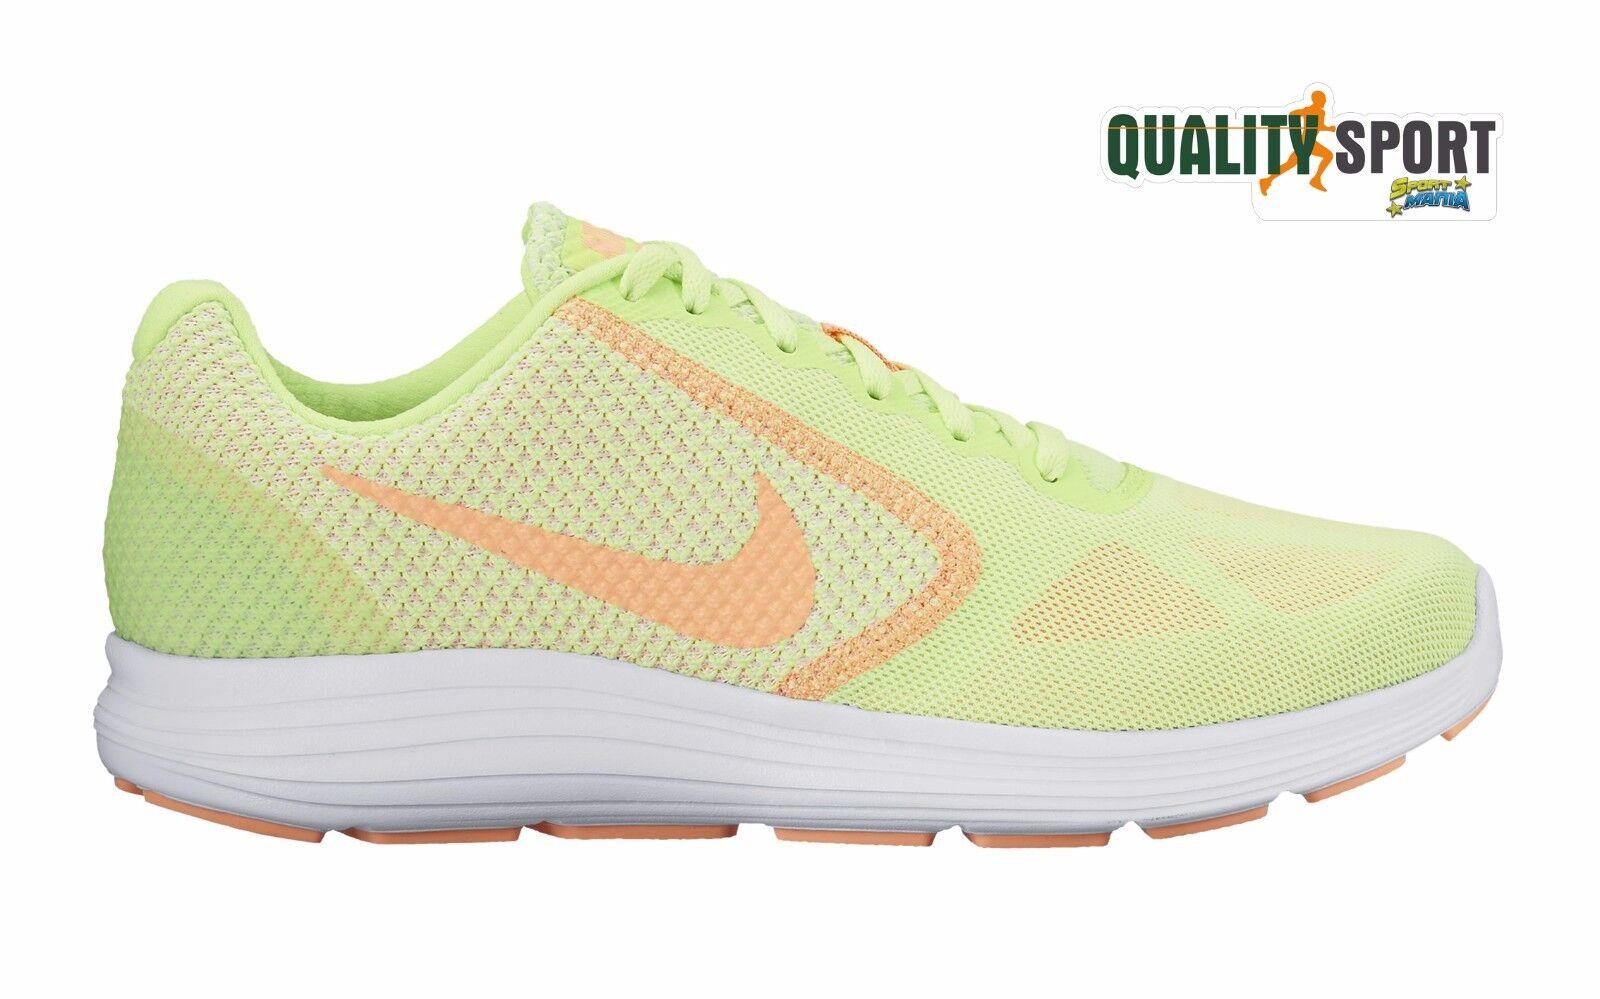 Nike Revolution 3 Verde + Arancio Donna Scarpe 302 Sportive Baskets 819303 302 Scarpe a8ea41